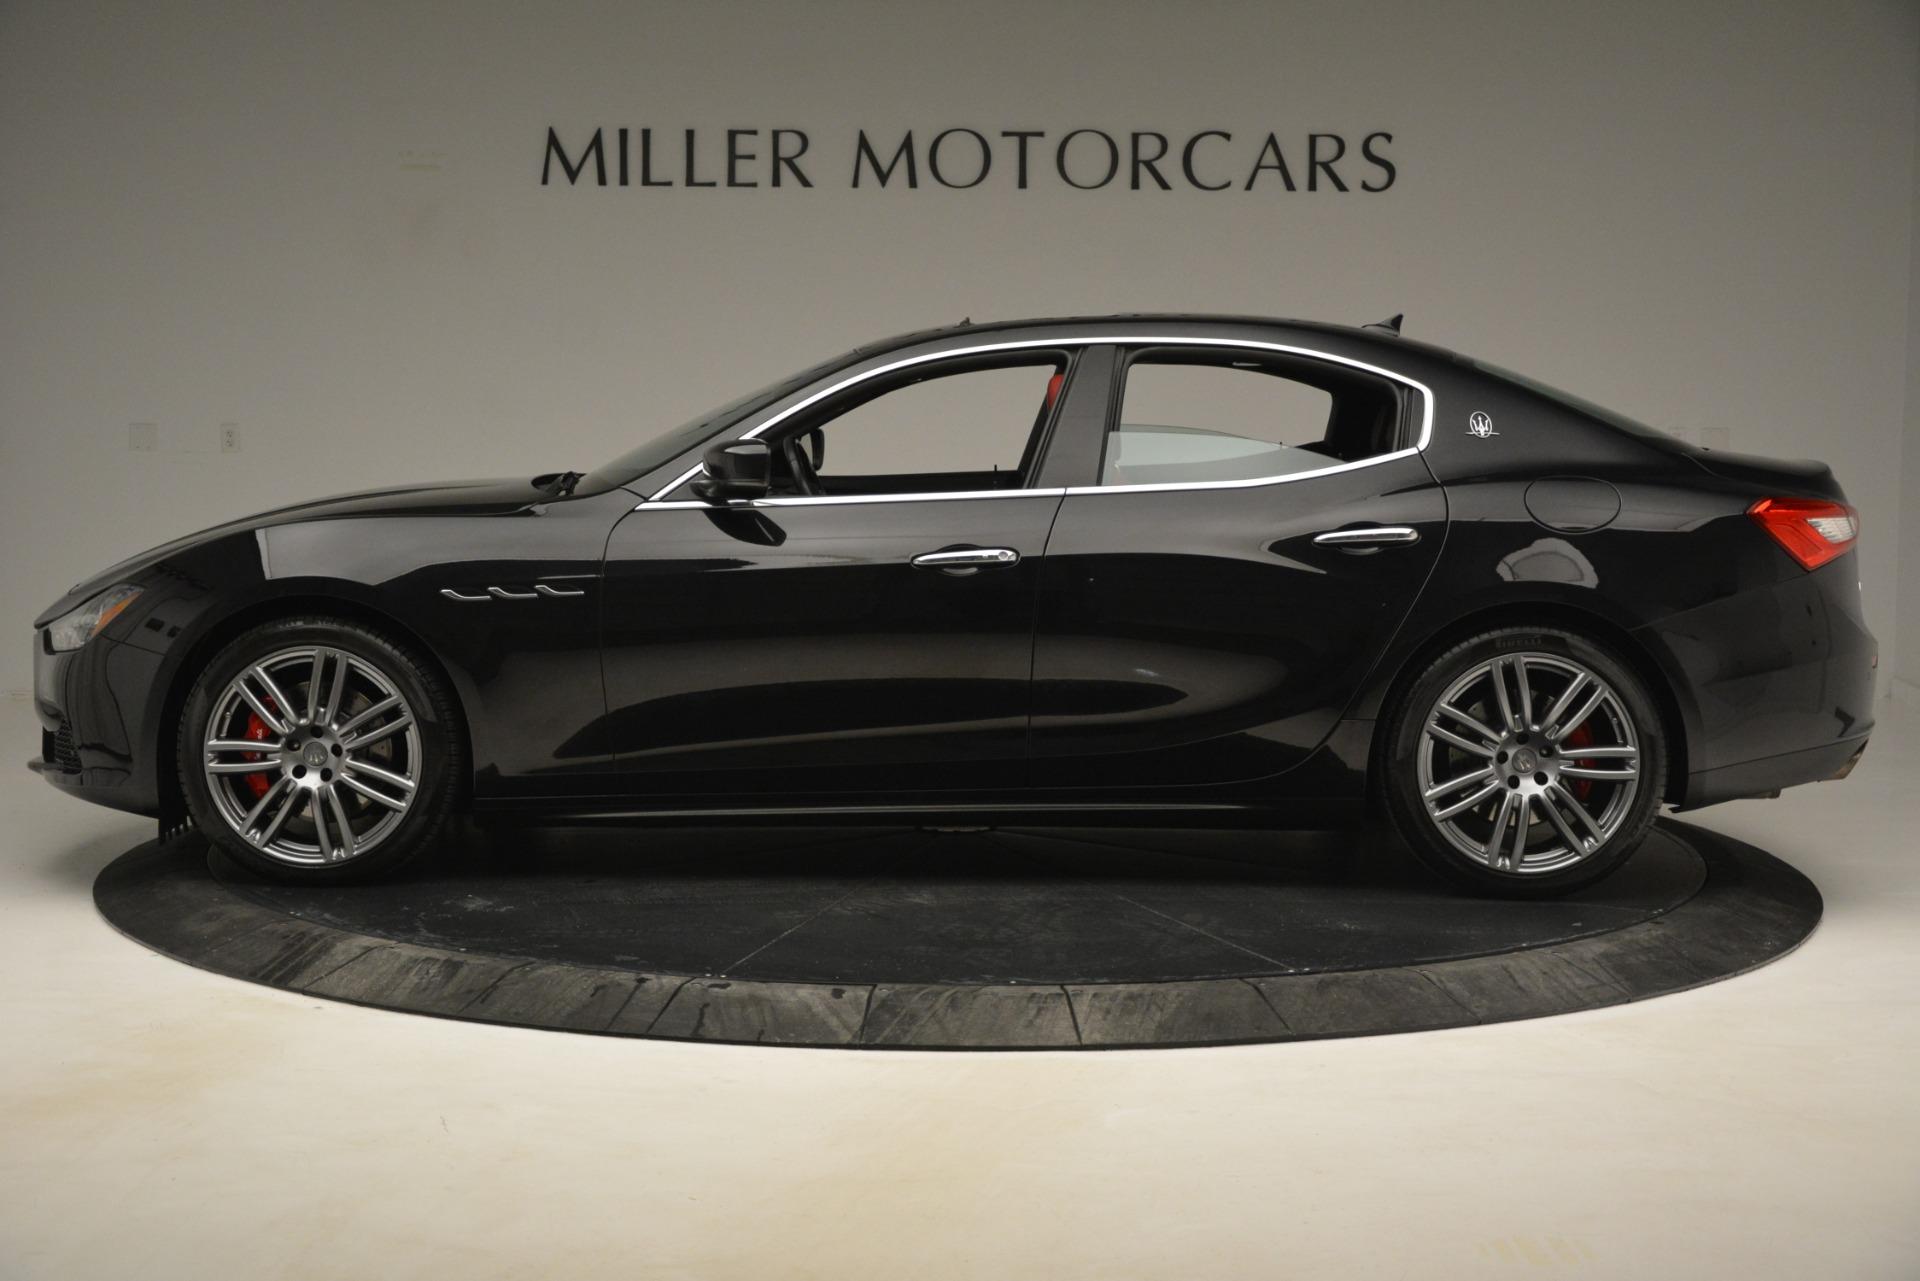 Used 2016 Maserati Ghibli S Q4 For Sale In Greenwich, CT 2945_p4